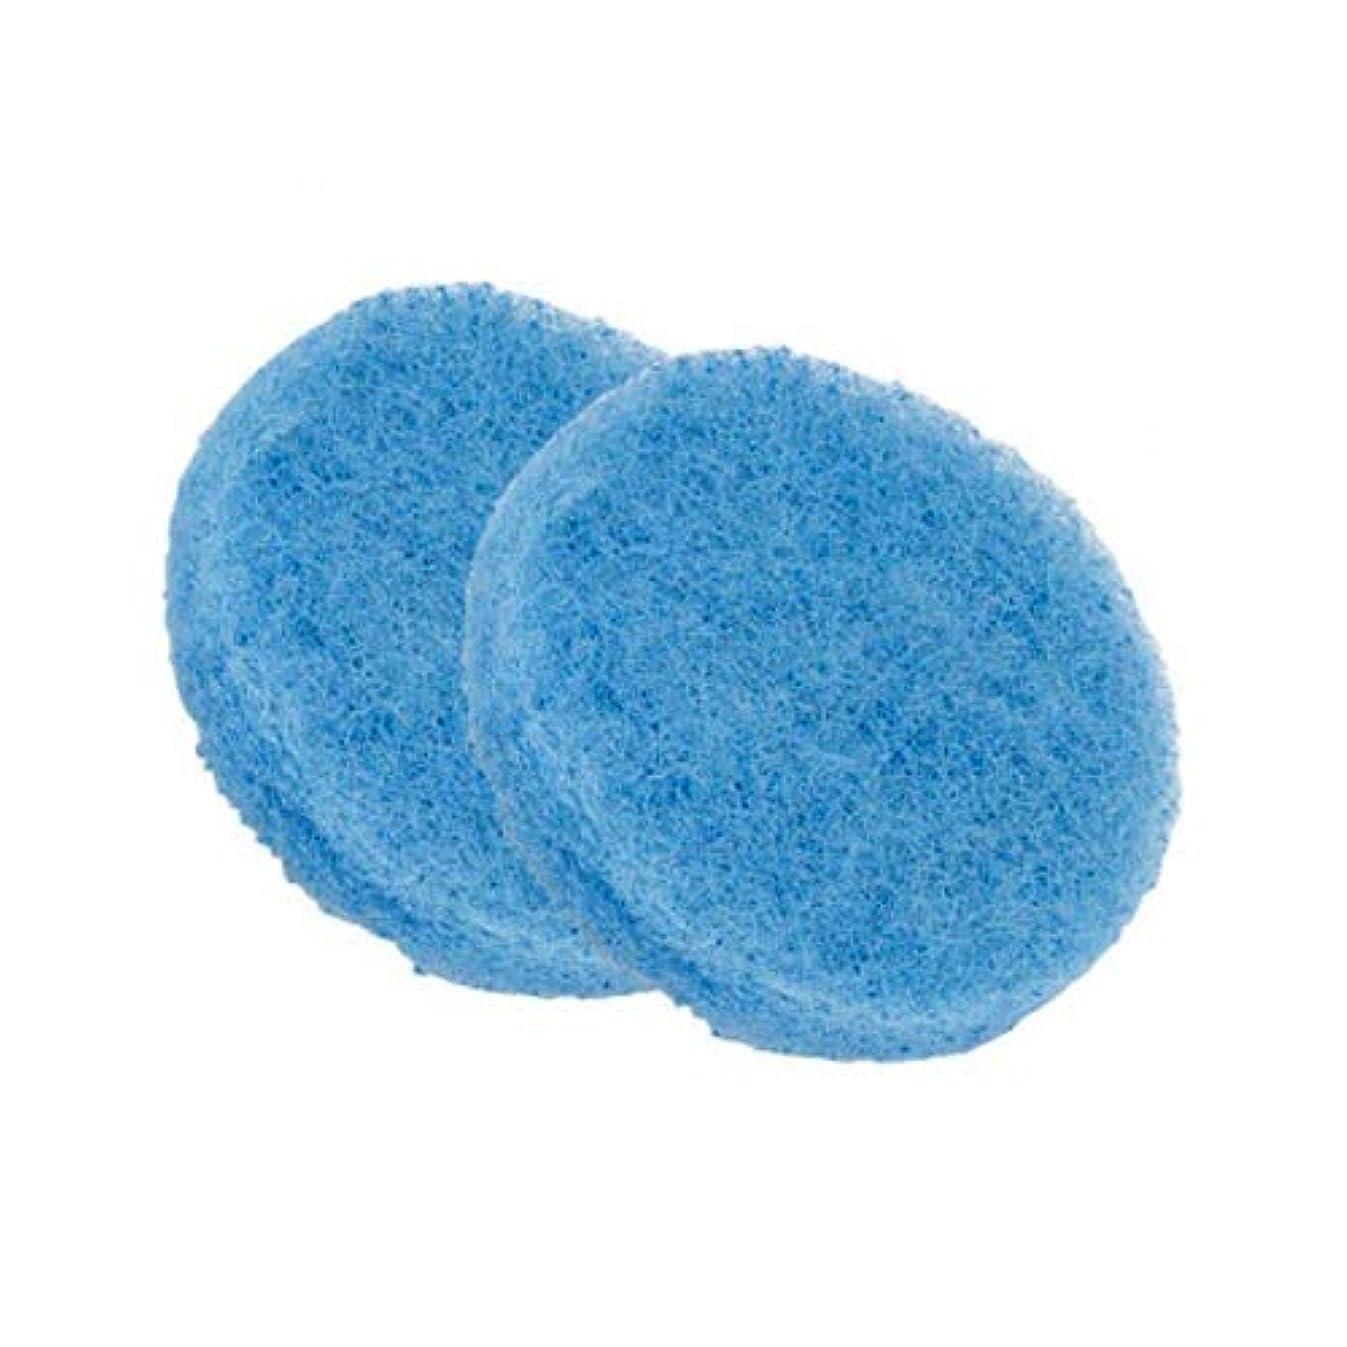 Black and Decker S700E Scum buster 2 Pack Blue Scrubbing Pad # 90522701-2PK